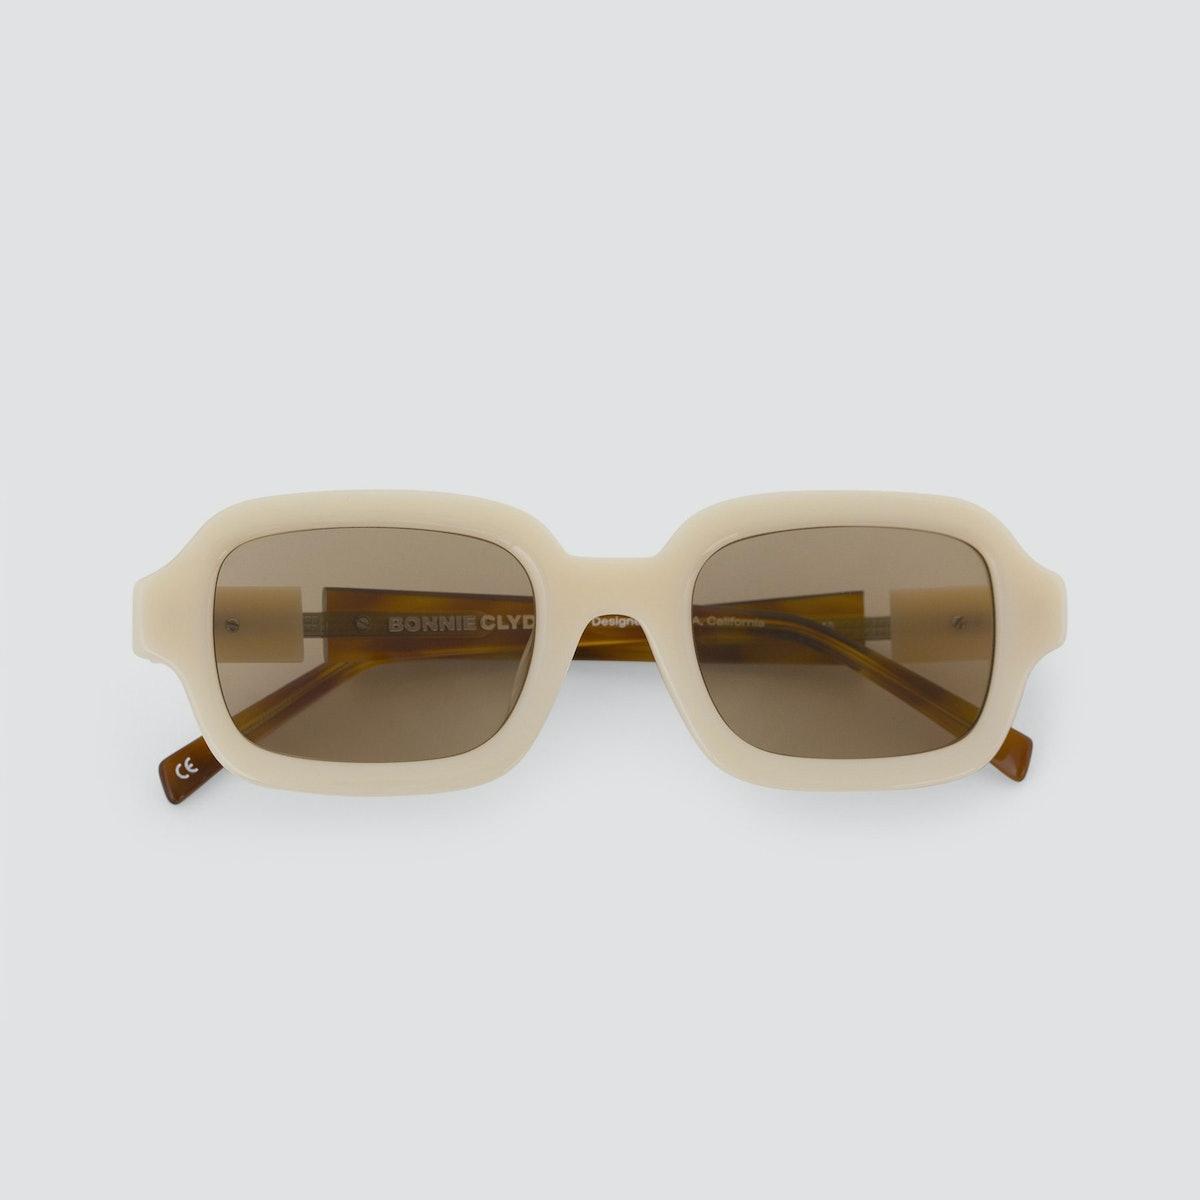 Bonnie & Clyde Sunglasses